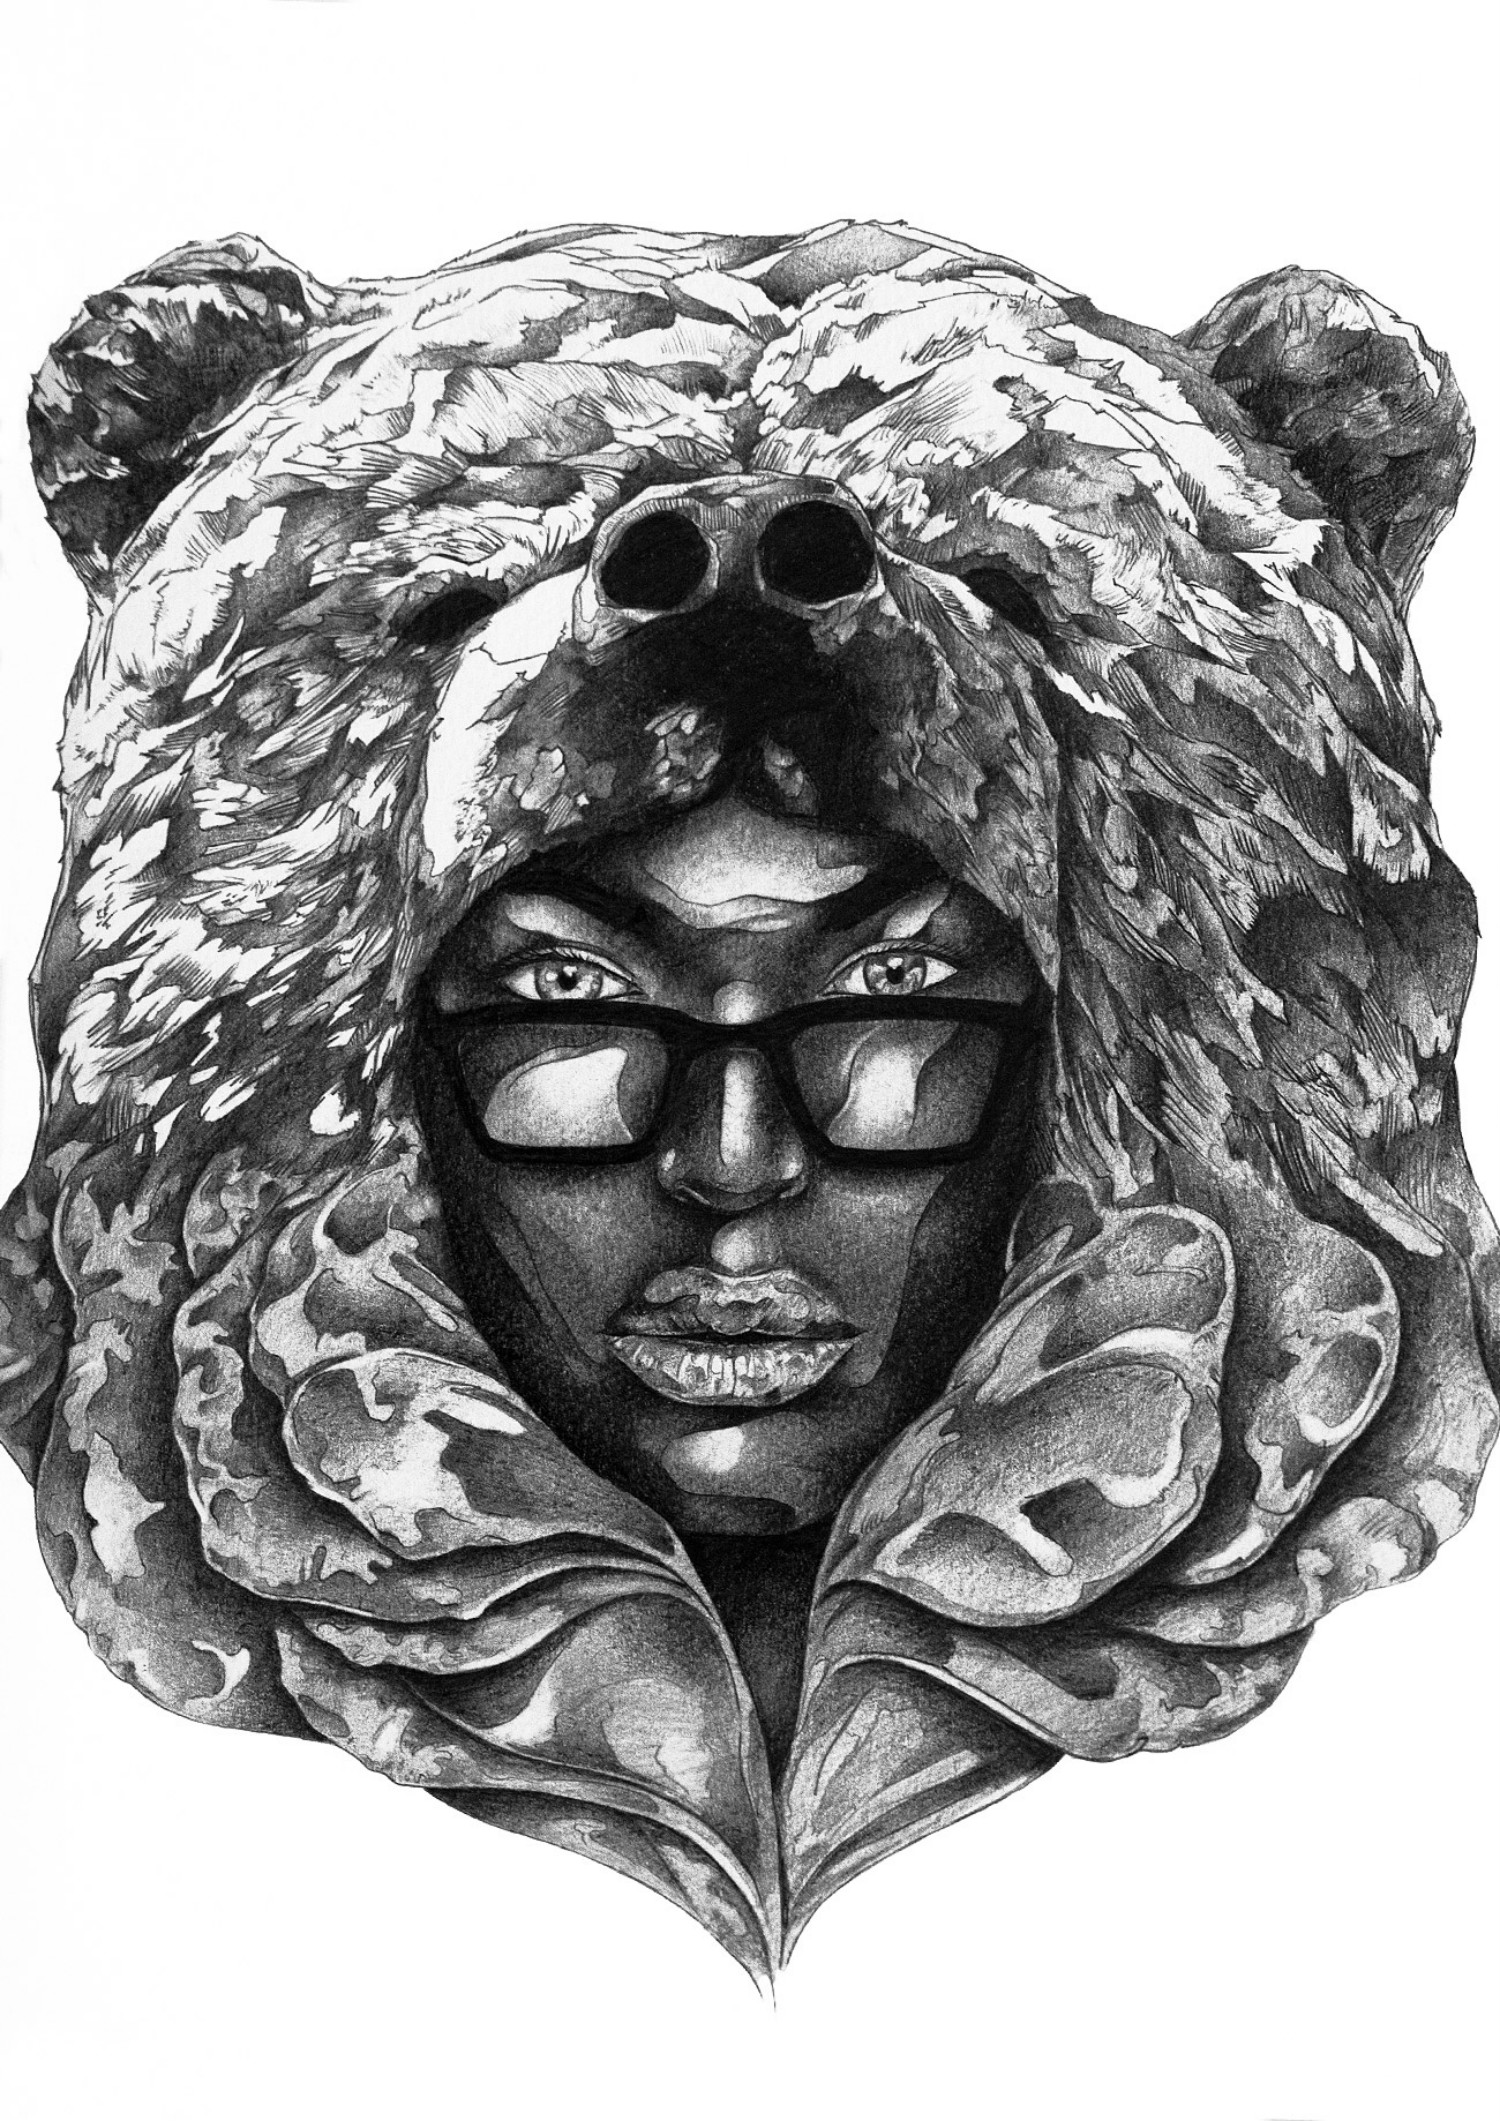 Ivan kamargio illustration 7